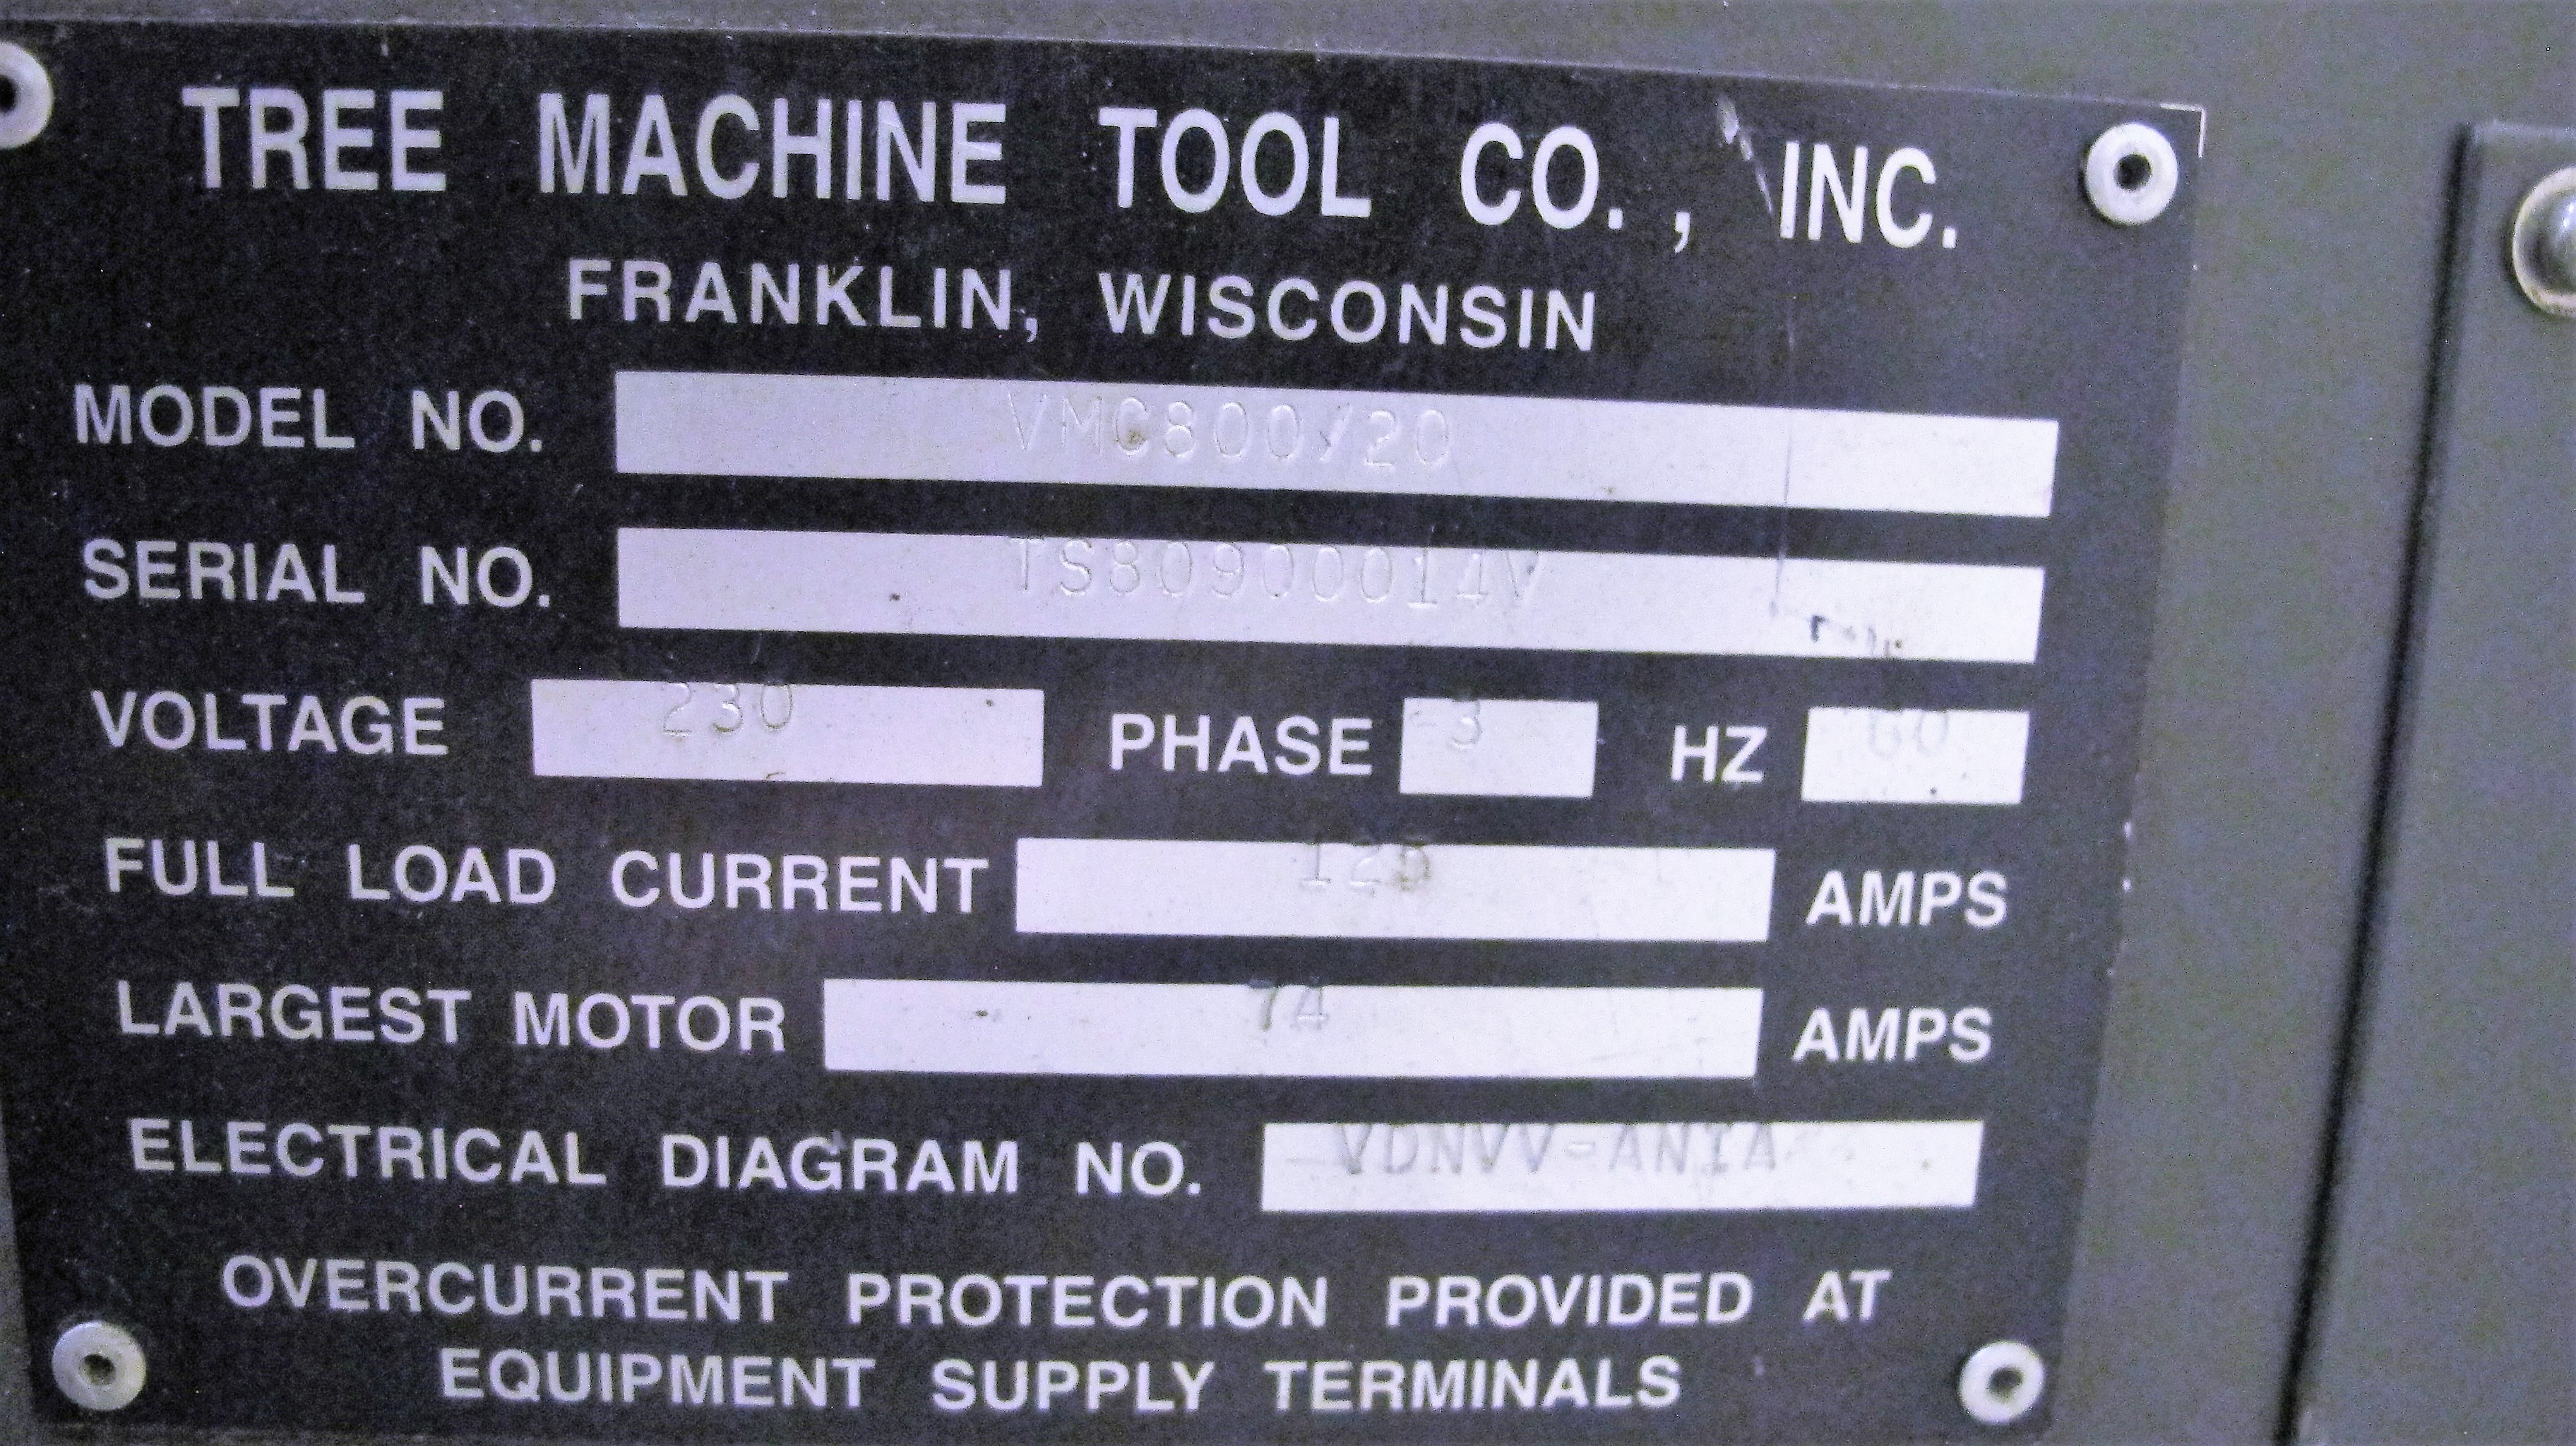 "TREEVMC 800/20 CNC VERTICAL MACHINING CENTER, S/N TS80900014U, PC-2100 CNC CONTROL, ATC, 25"" x - Image 11 of 16"